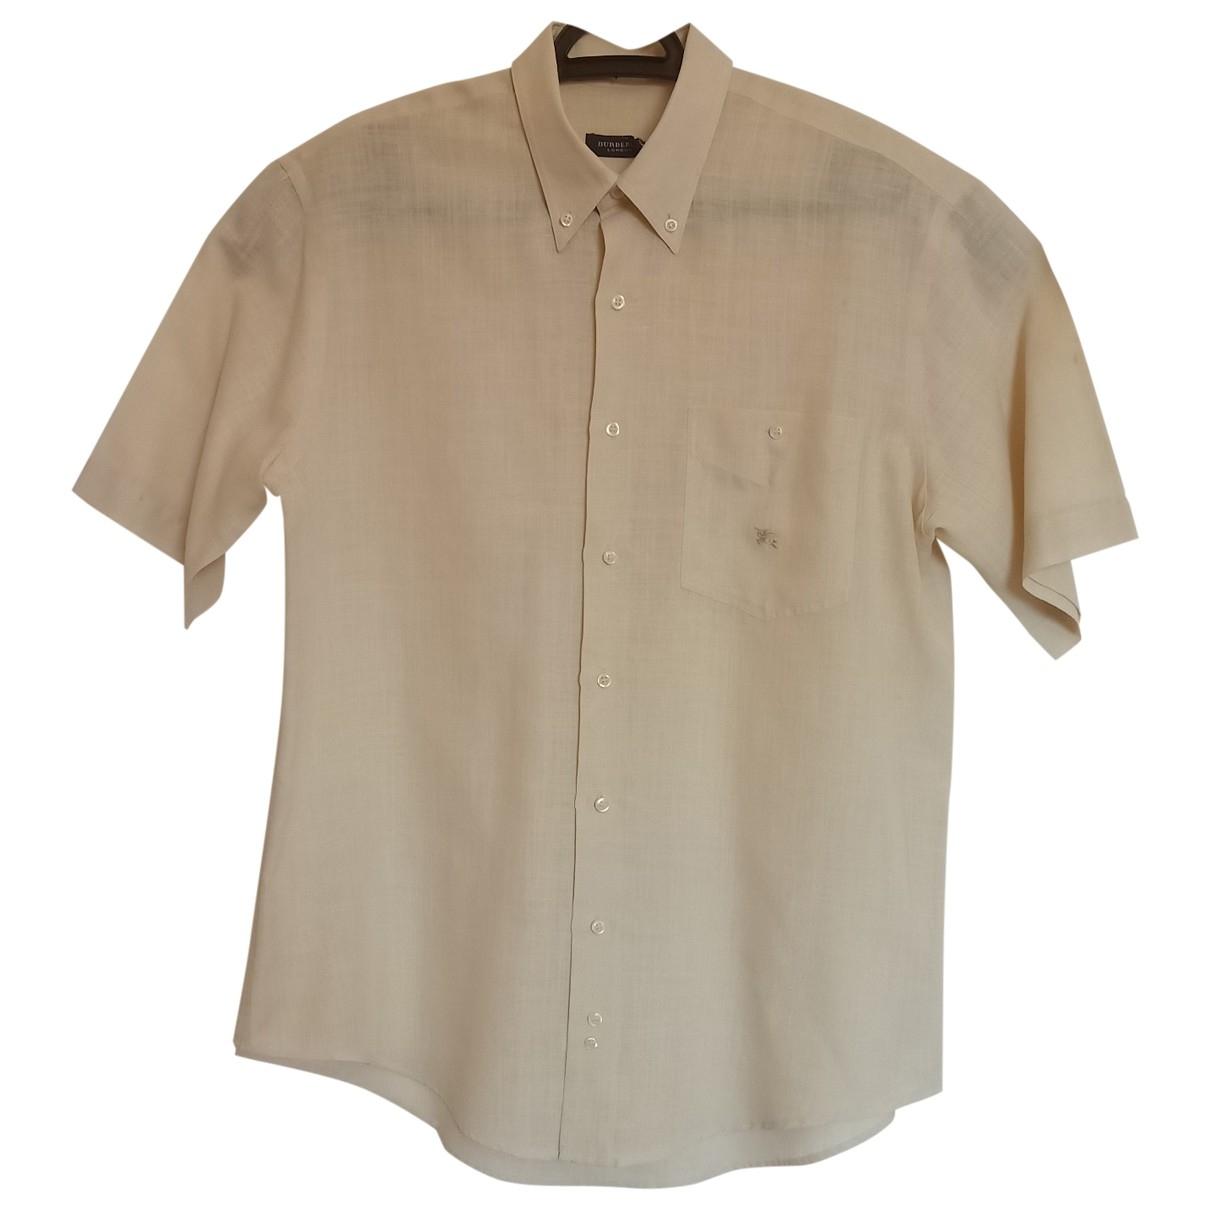 Burberry \N Hemden in  Beige Polyester